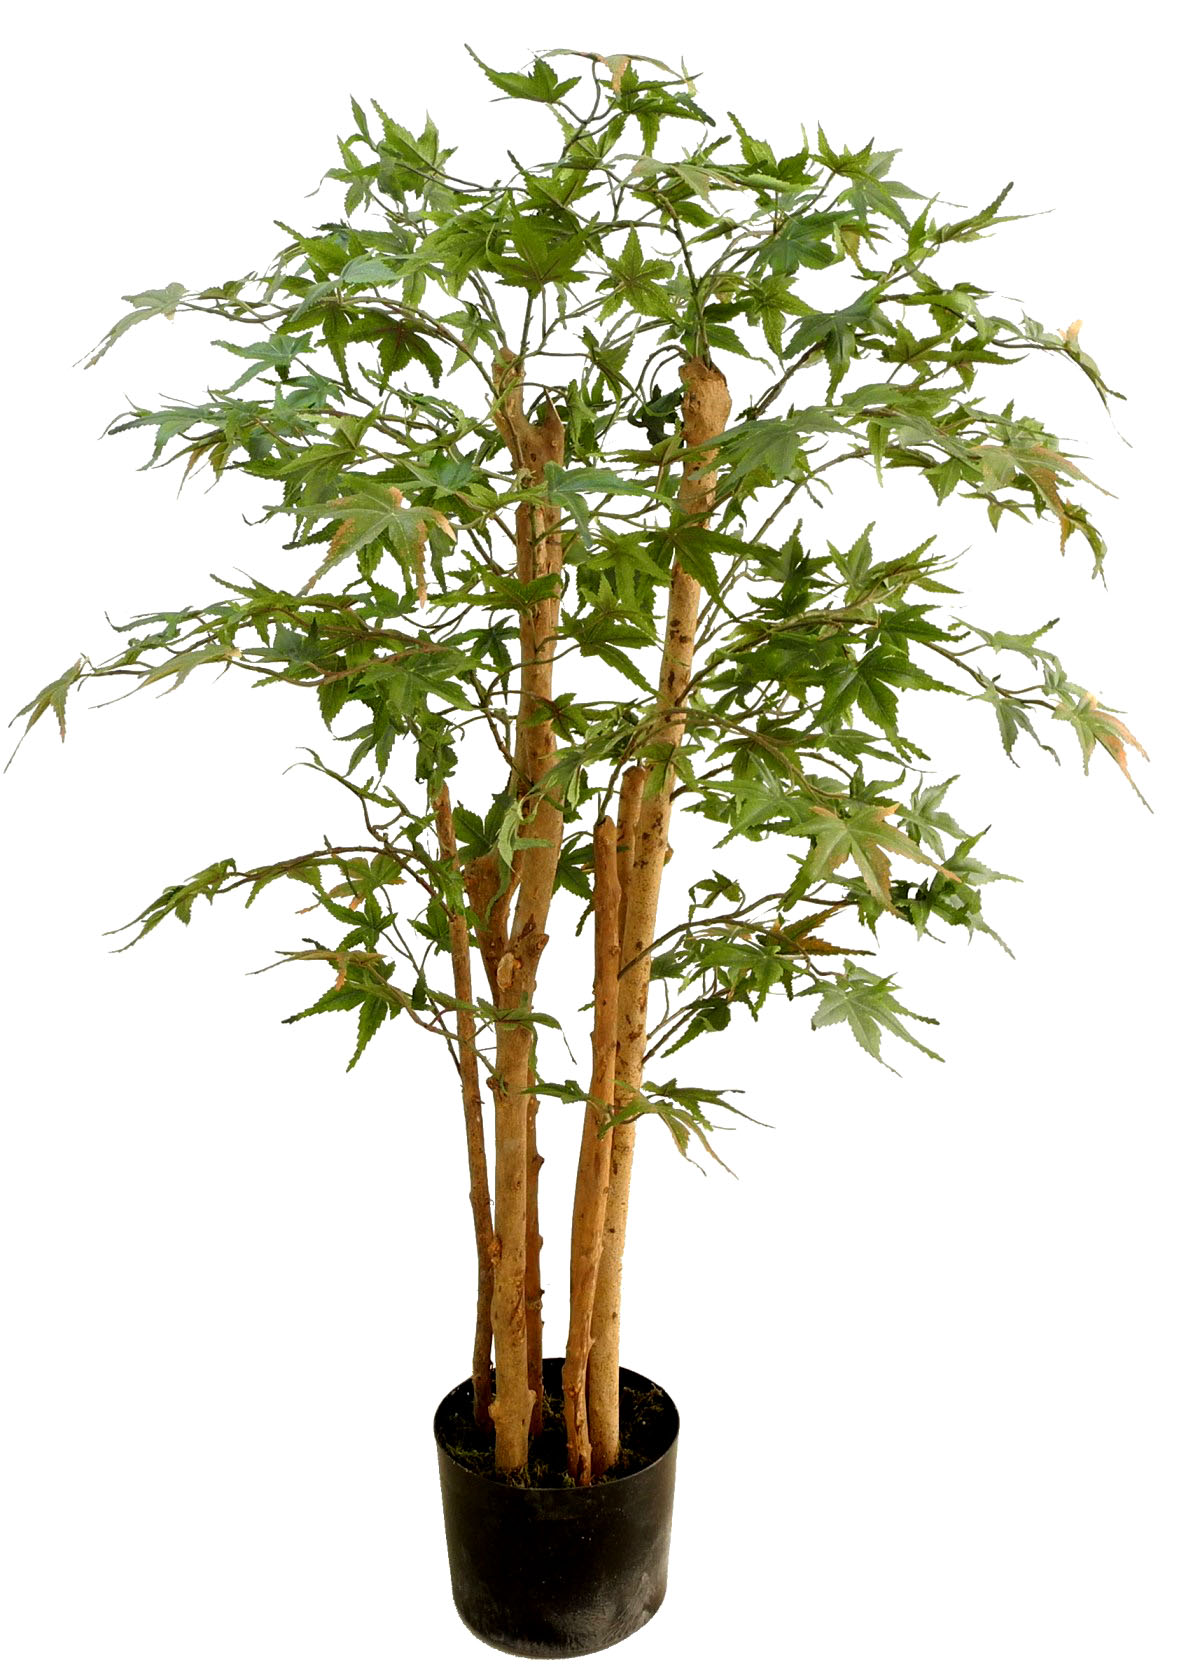 japanischer ahornbaum 90cm da kunstbaum kunstpflanzen. Black Bedroom Furniture Sets. Home Design Ideas